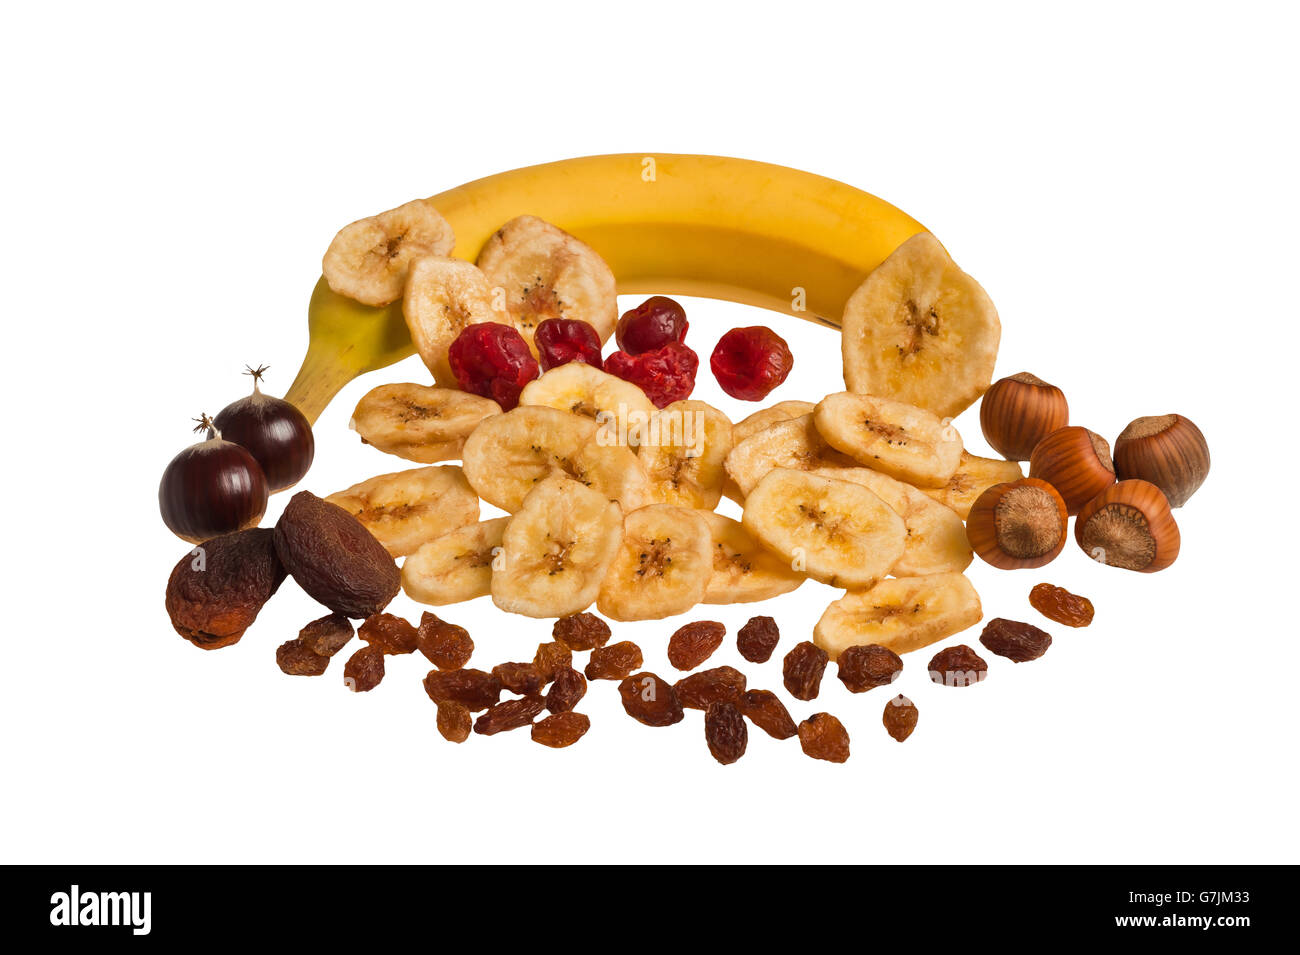 Dried fruit mix isolated on white - Stock Image